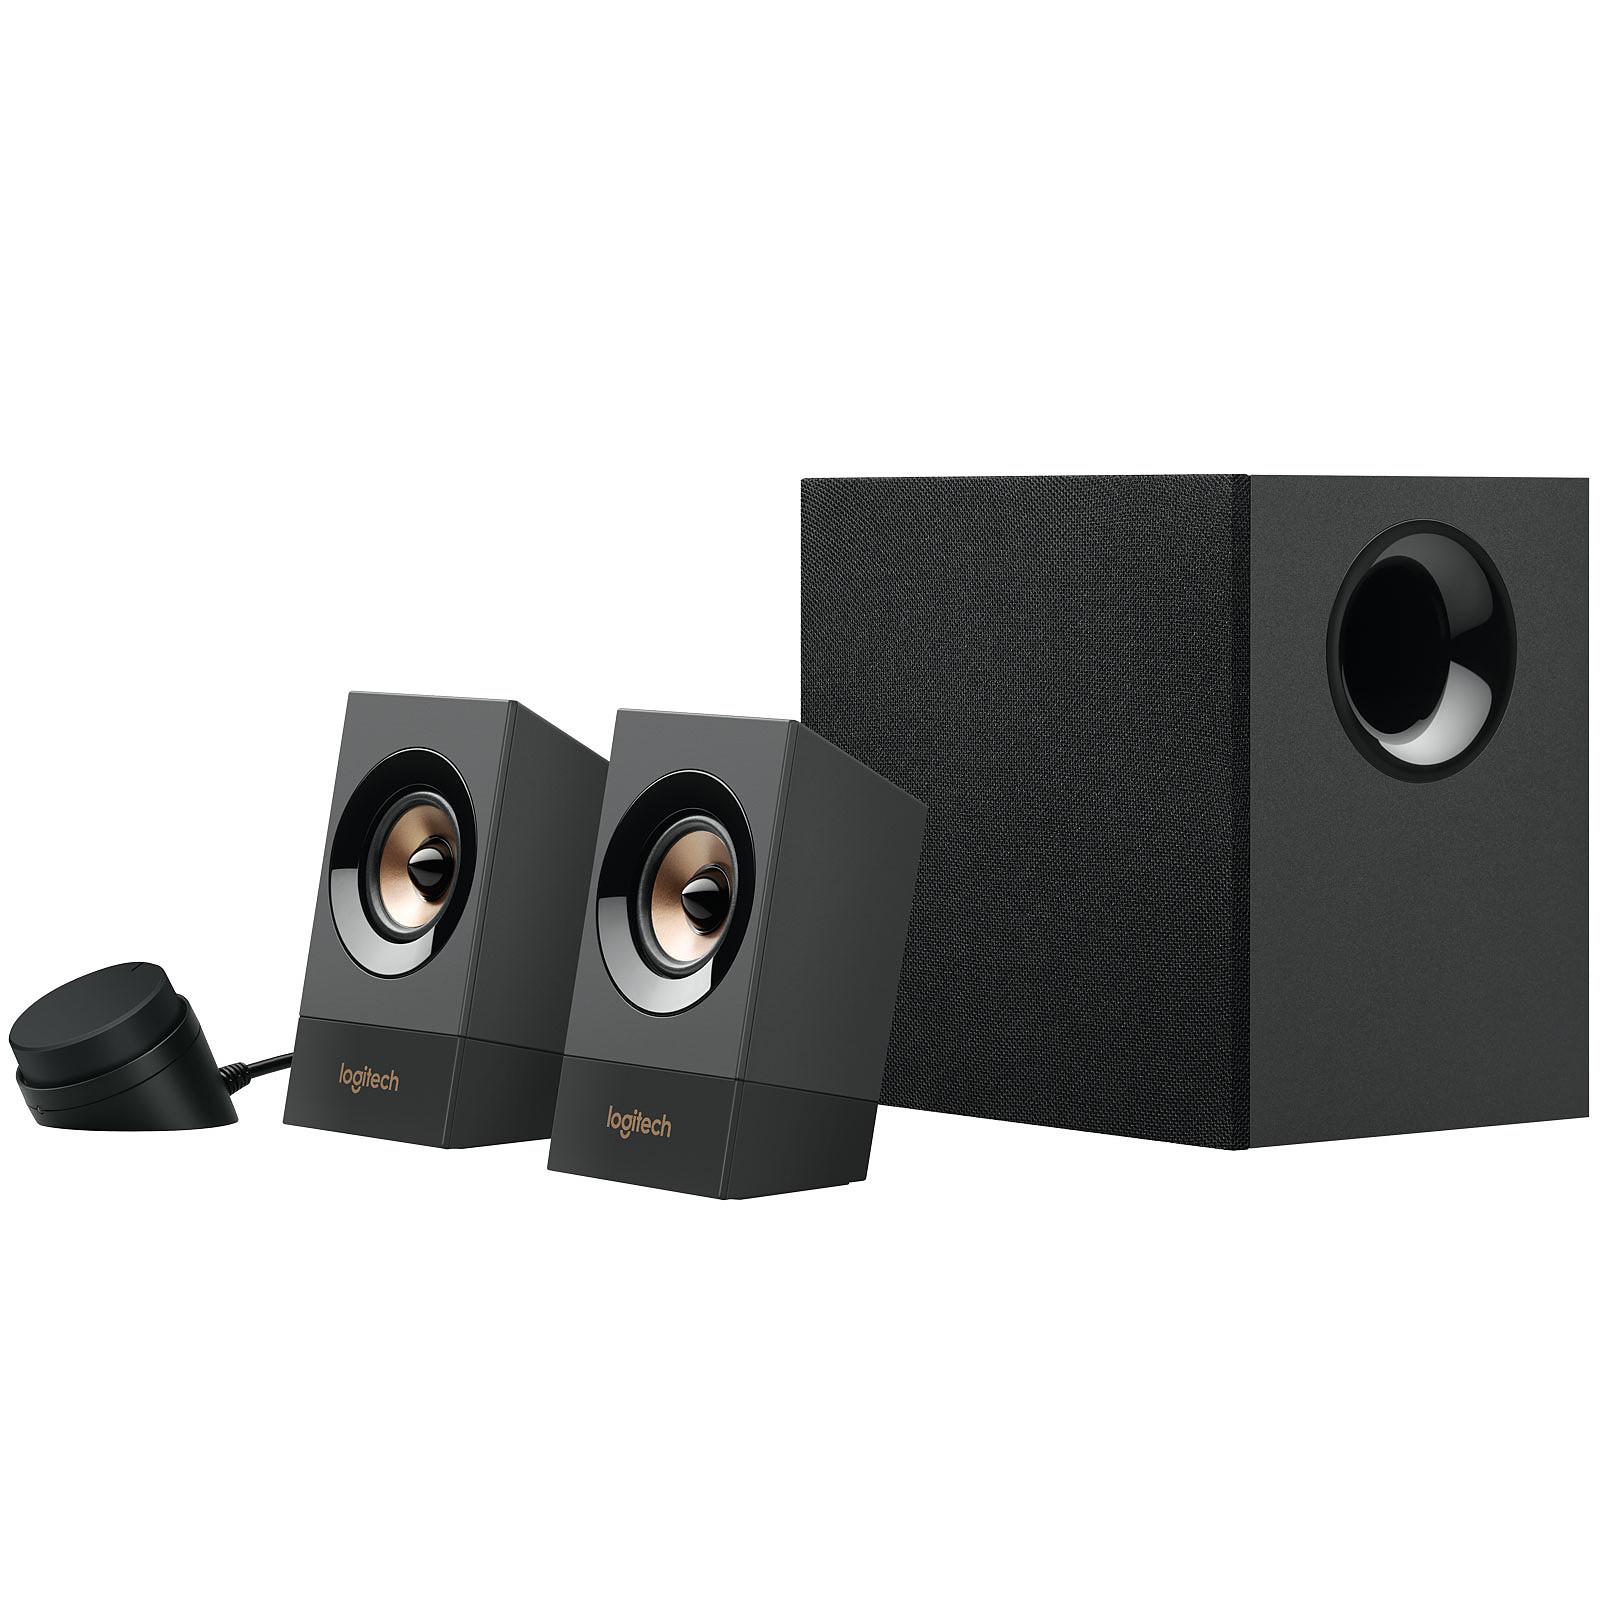 Logitech Z537 Powerful Speakers with Bluetooth